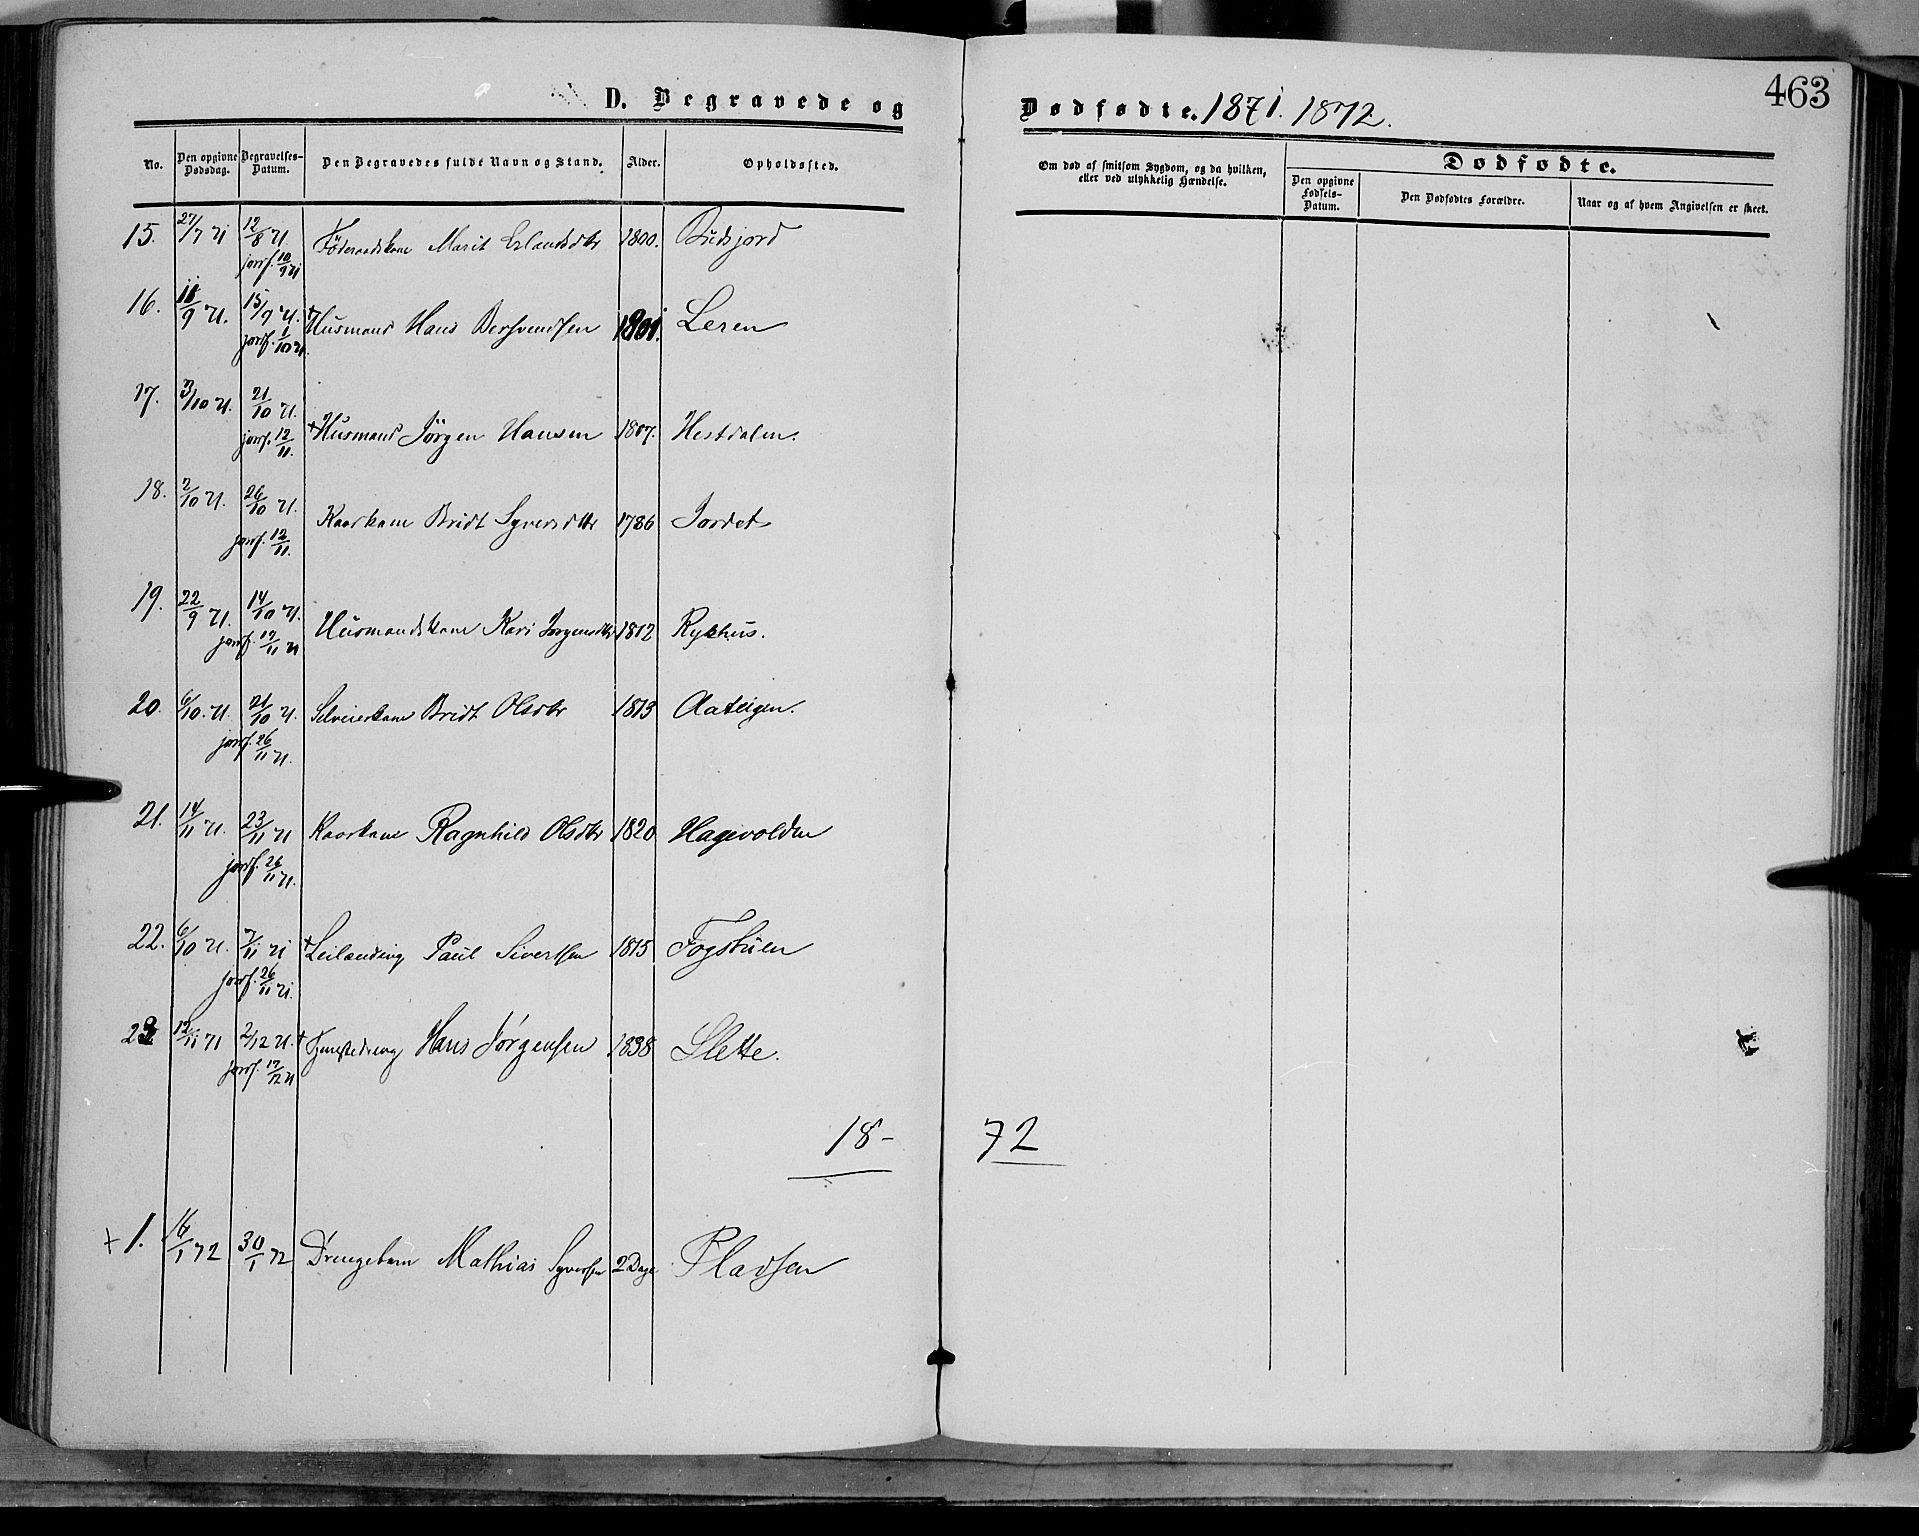 SAH, Dovre prestekontor, Ministerialbok nr. 1, 1854-1878, s. 463